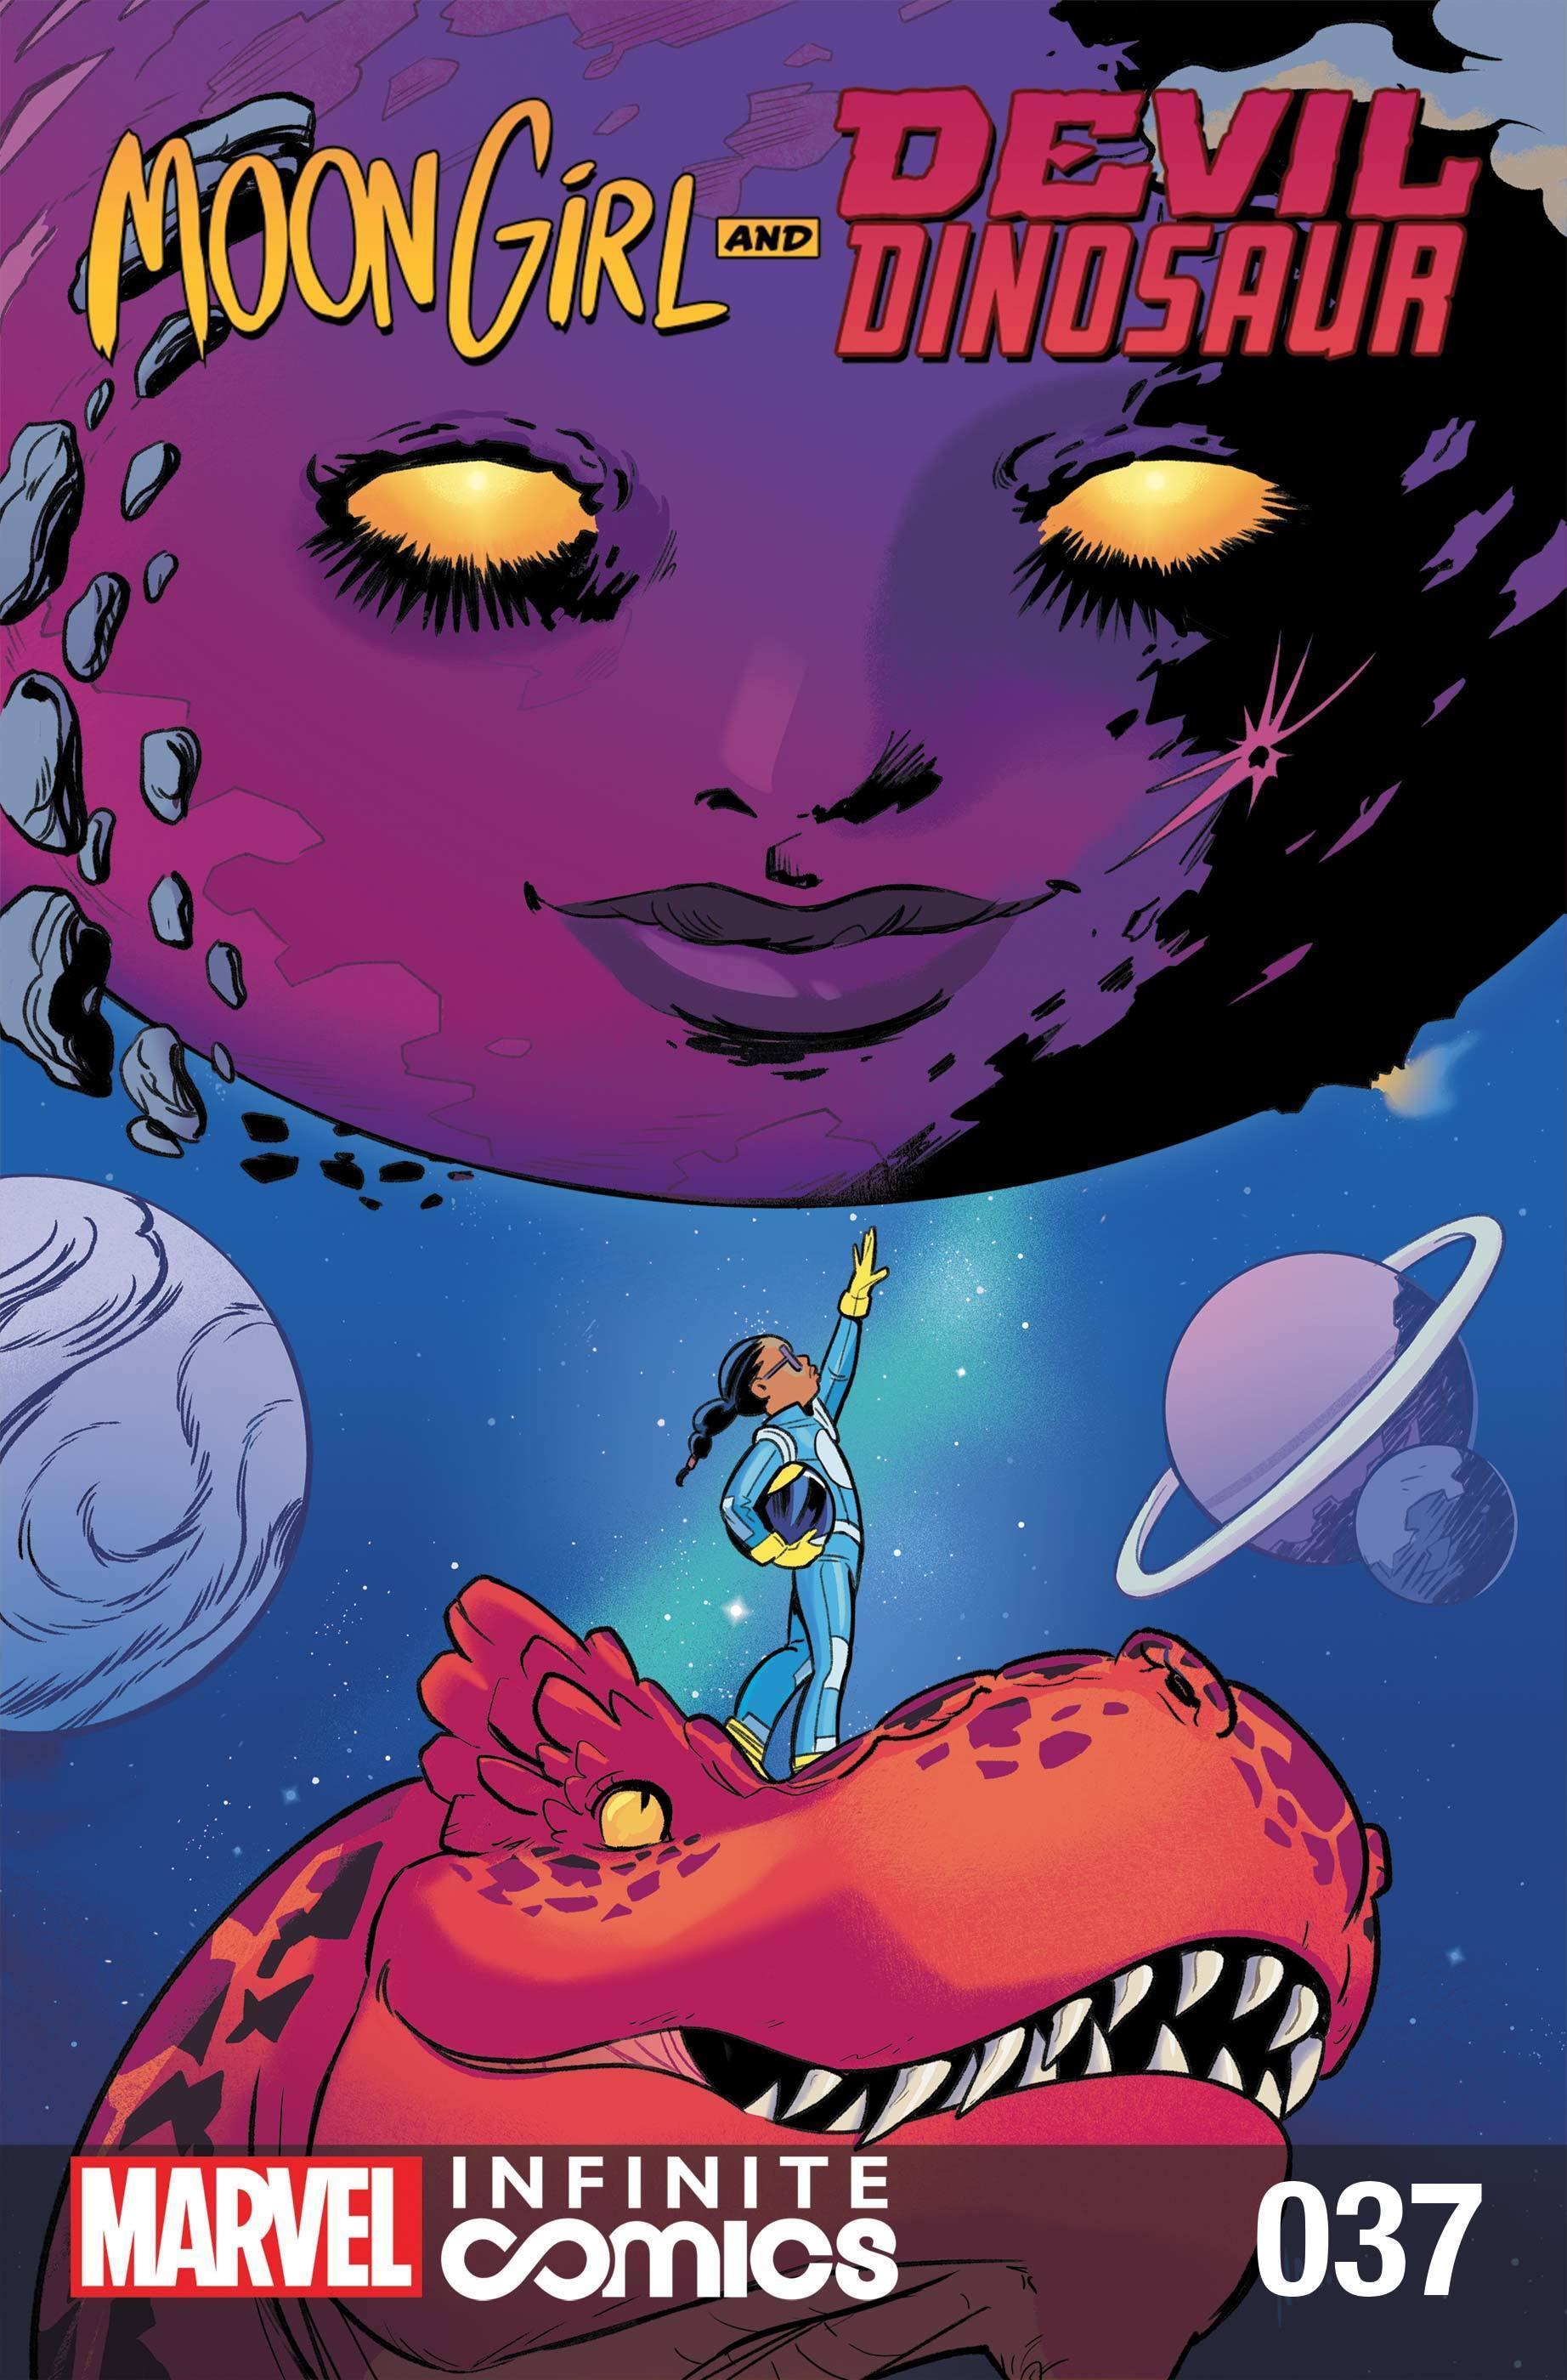 Moon Girl and Devil Dinosaur #37